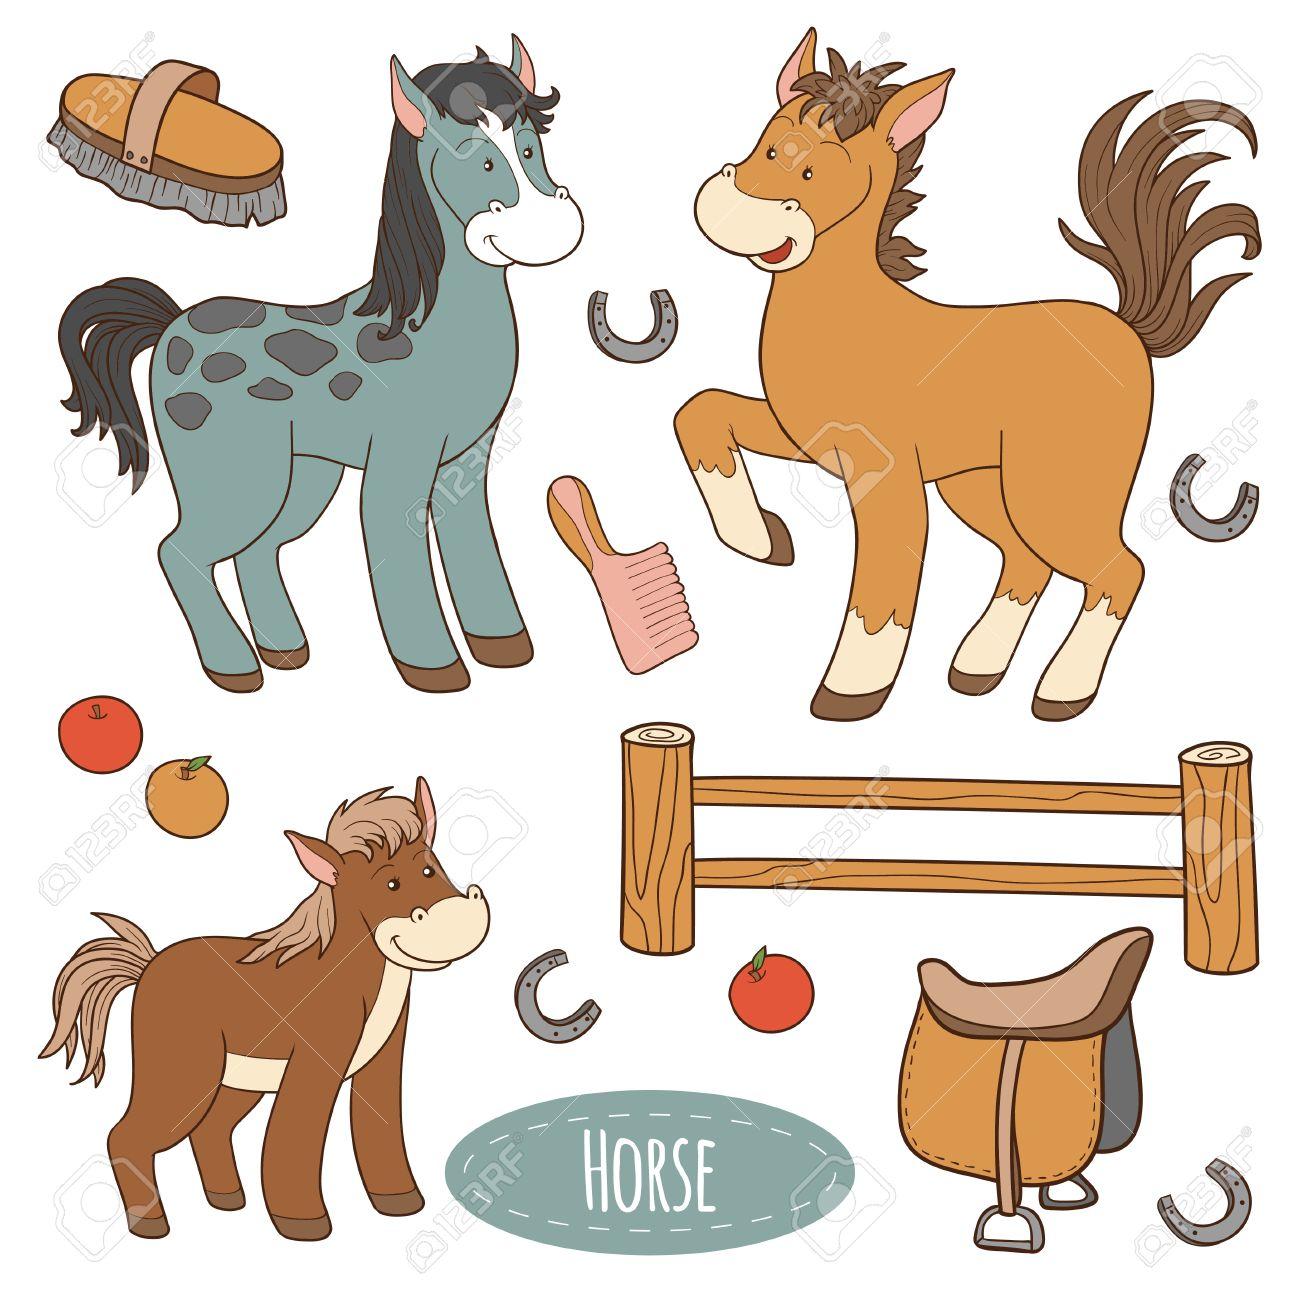 Horses clipart family. Horse cliparts x making